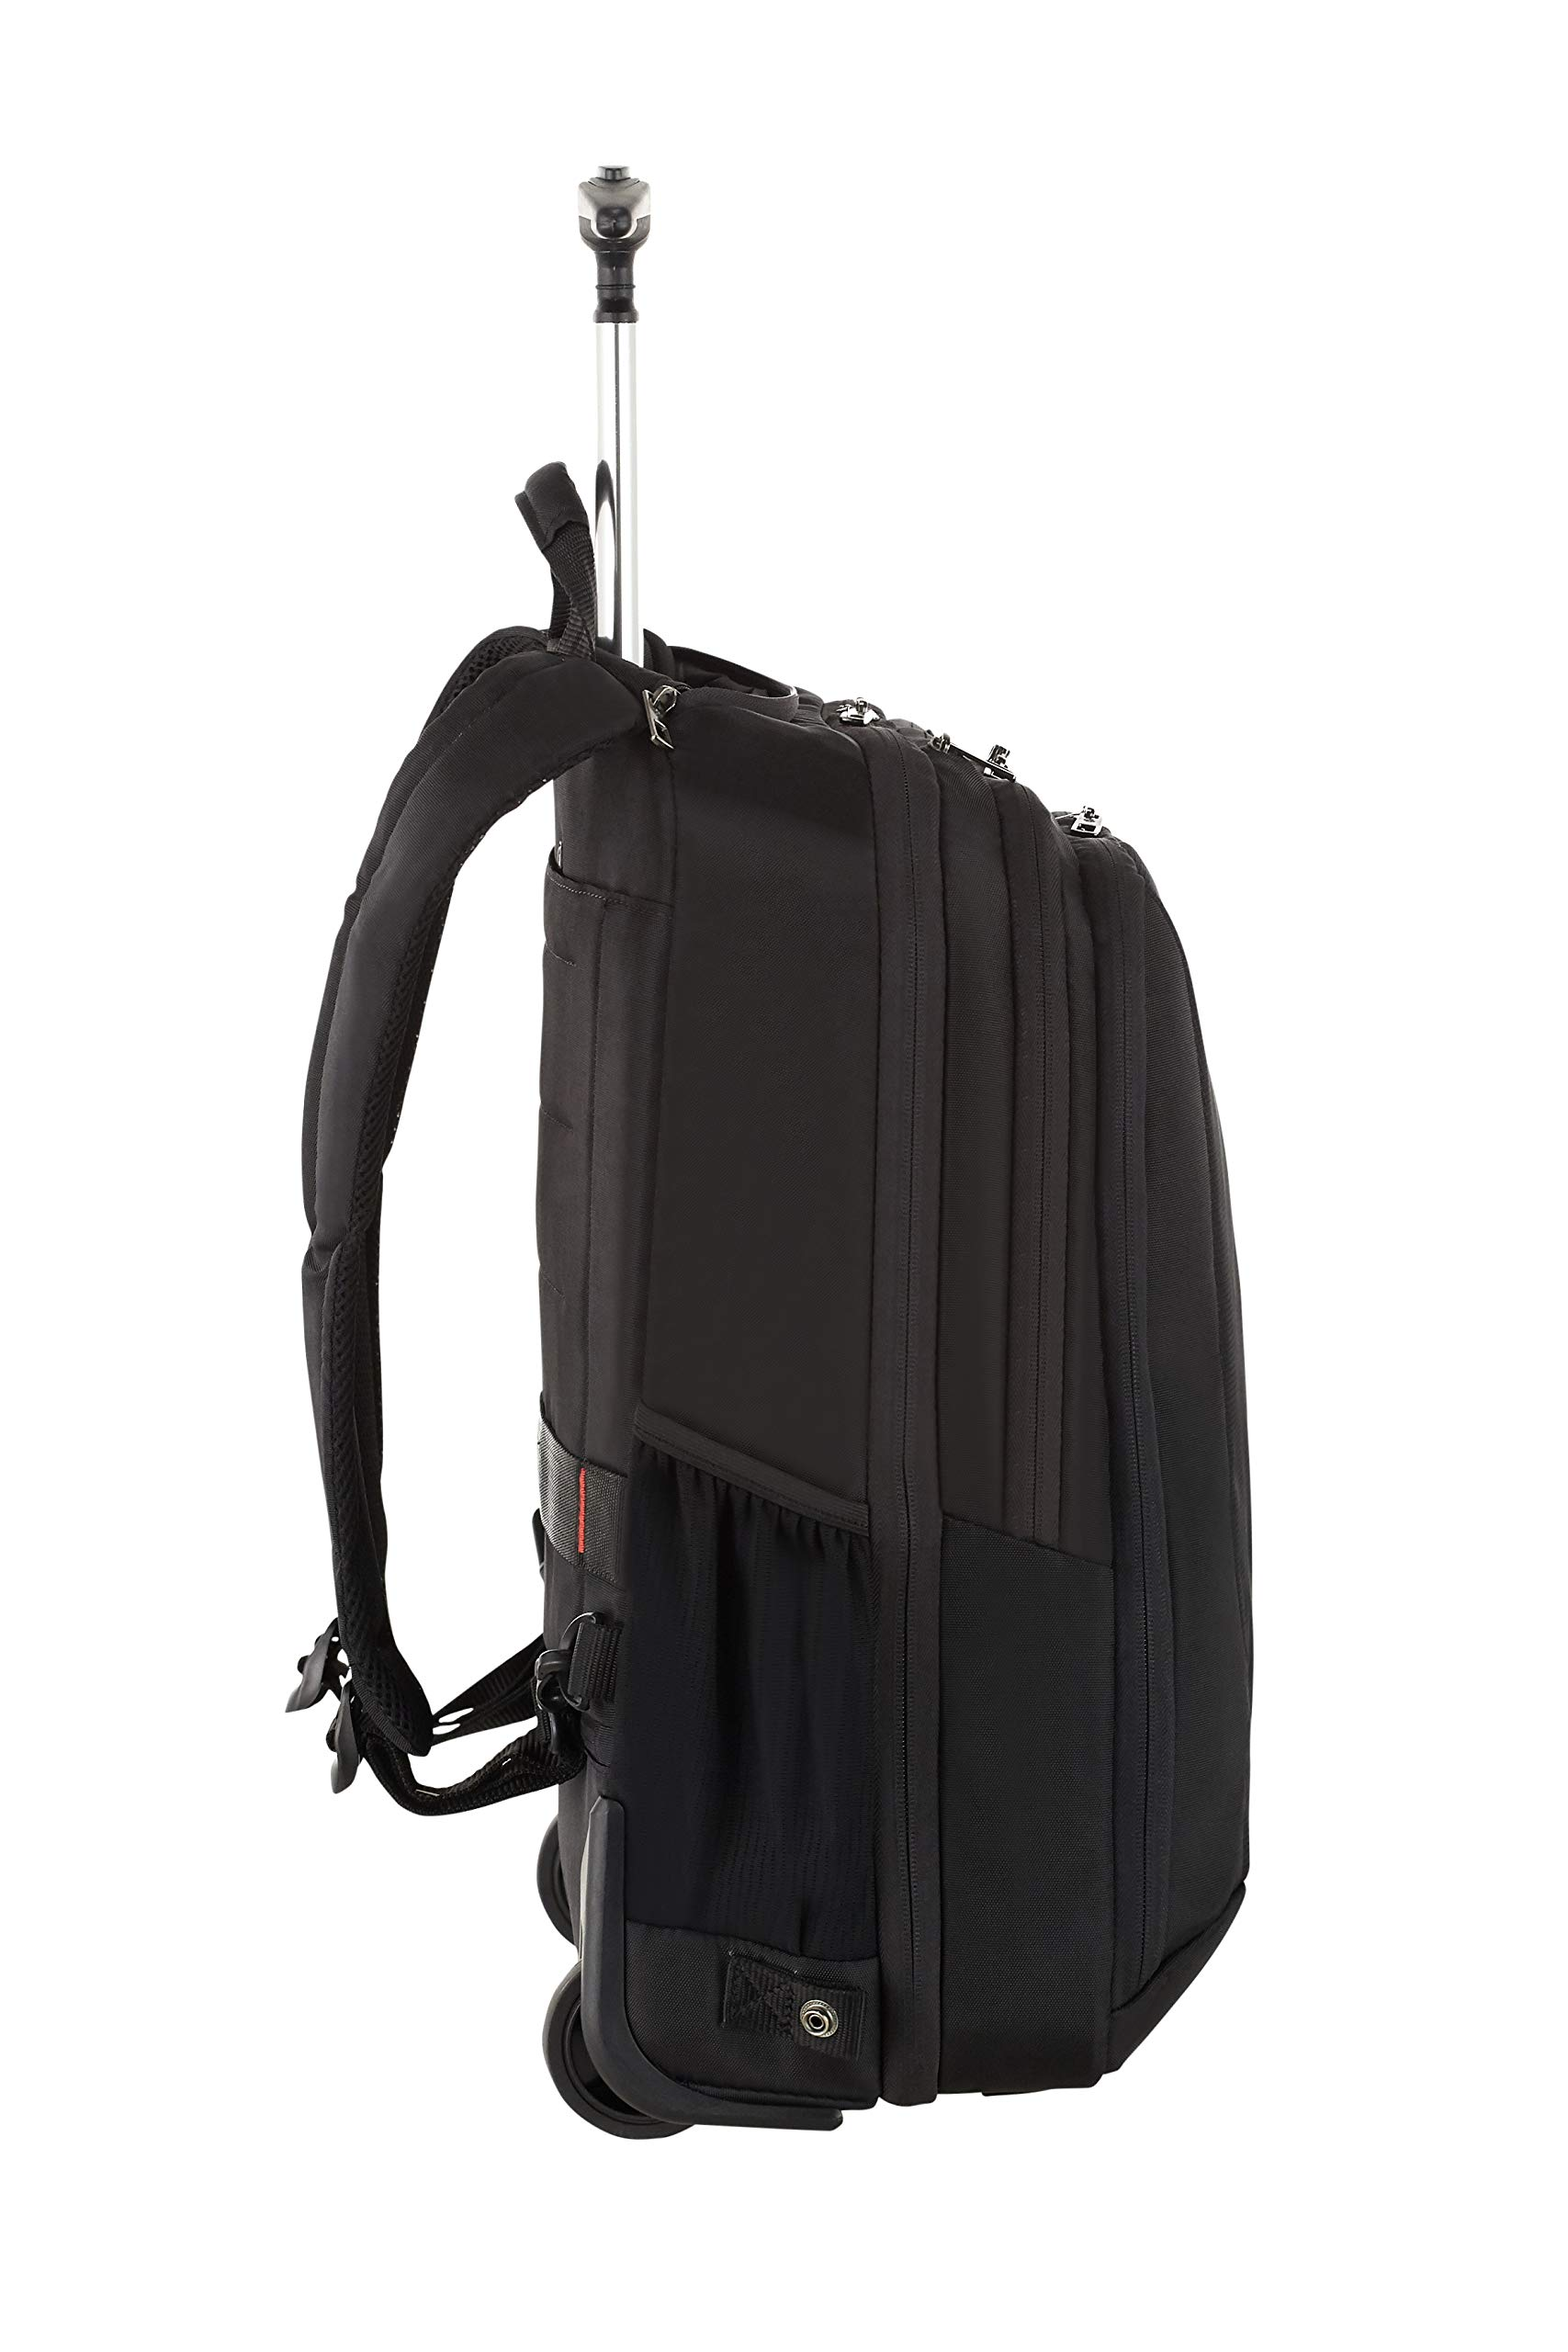 SAMSONITE *09 GUARDIT 2.0 Backpack 17 Borsa UOMO CARTELLA Porta PC CM5/009